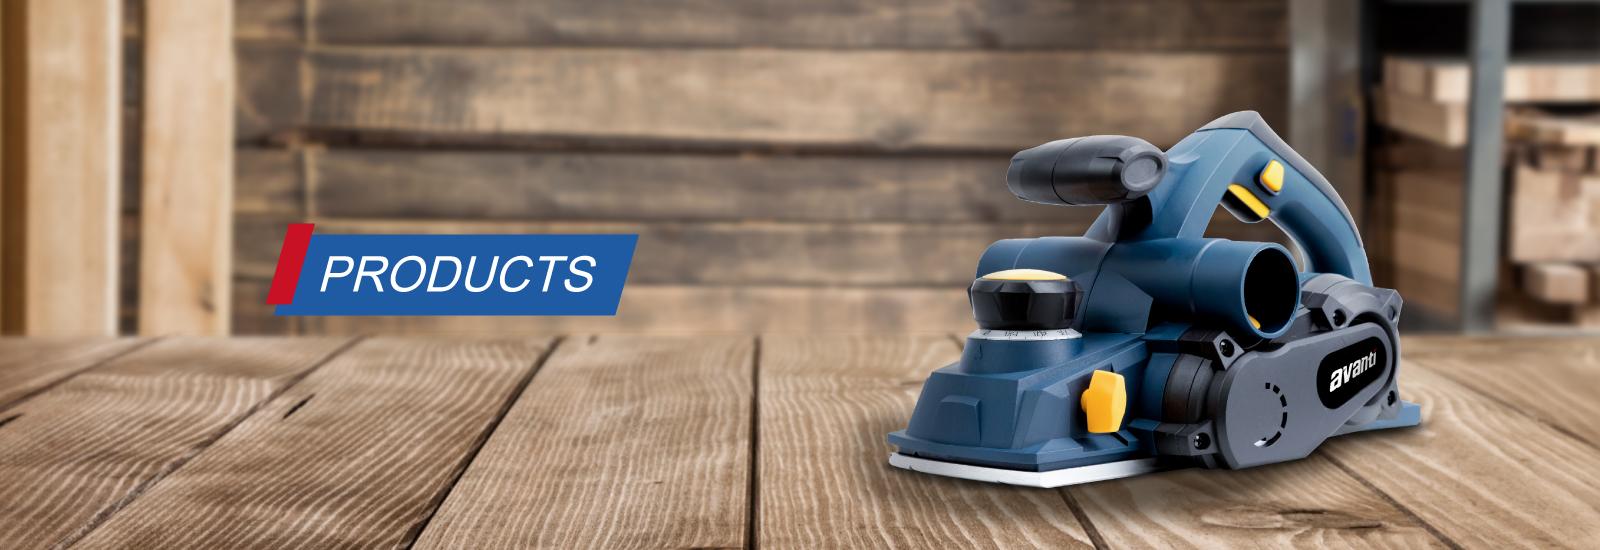 Avanti-Woodworking B1-Products